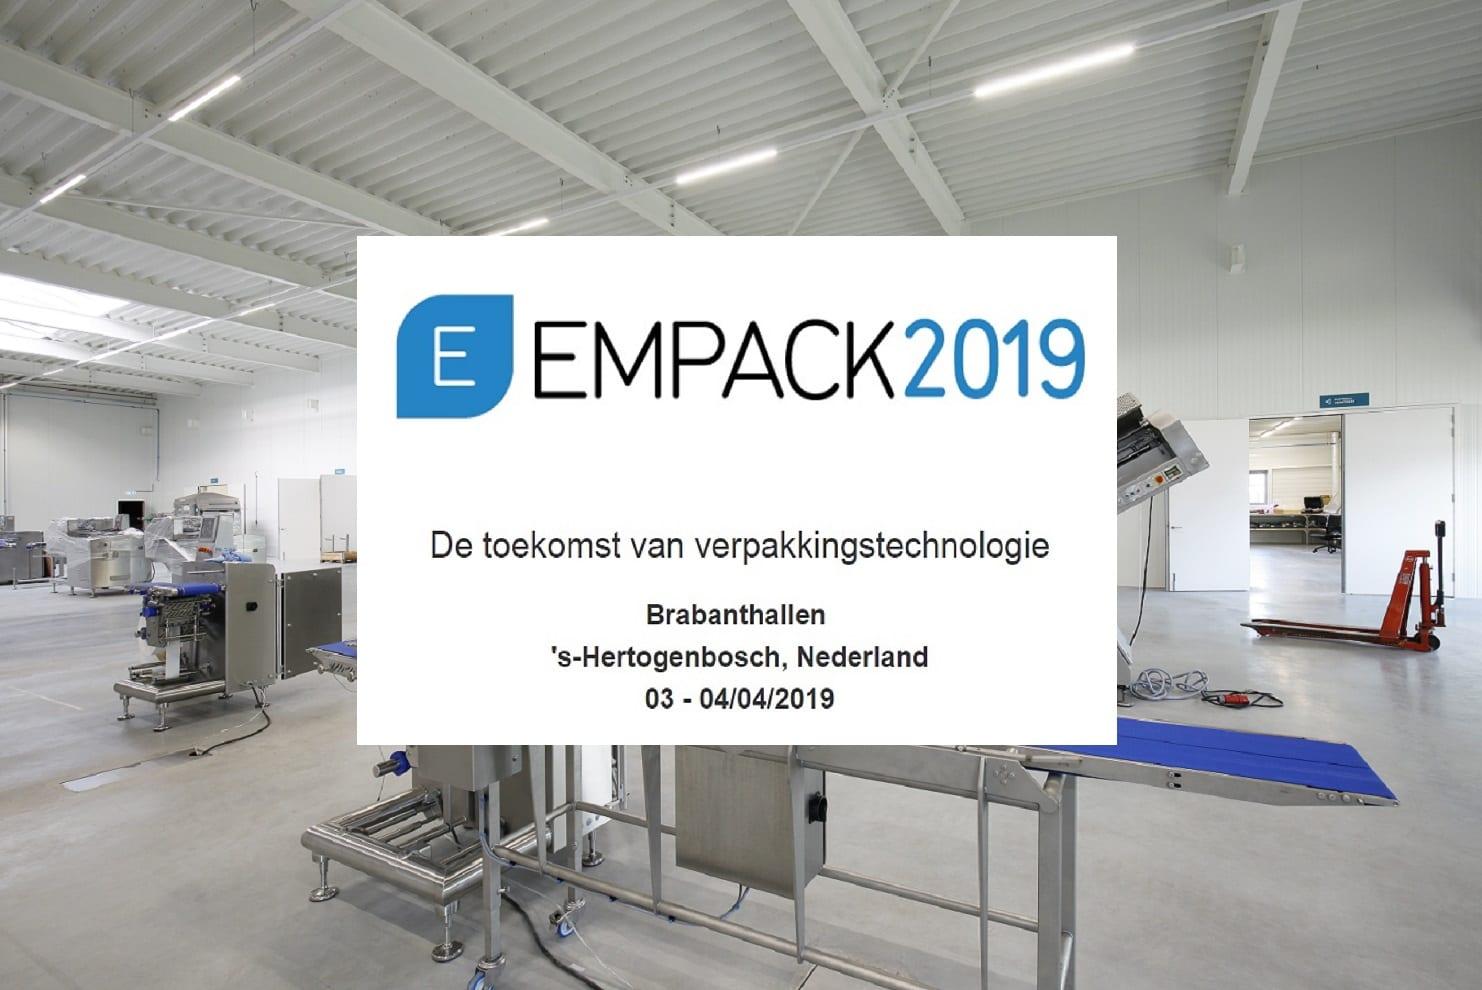 Empack 2019 website